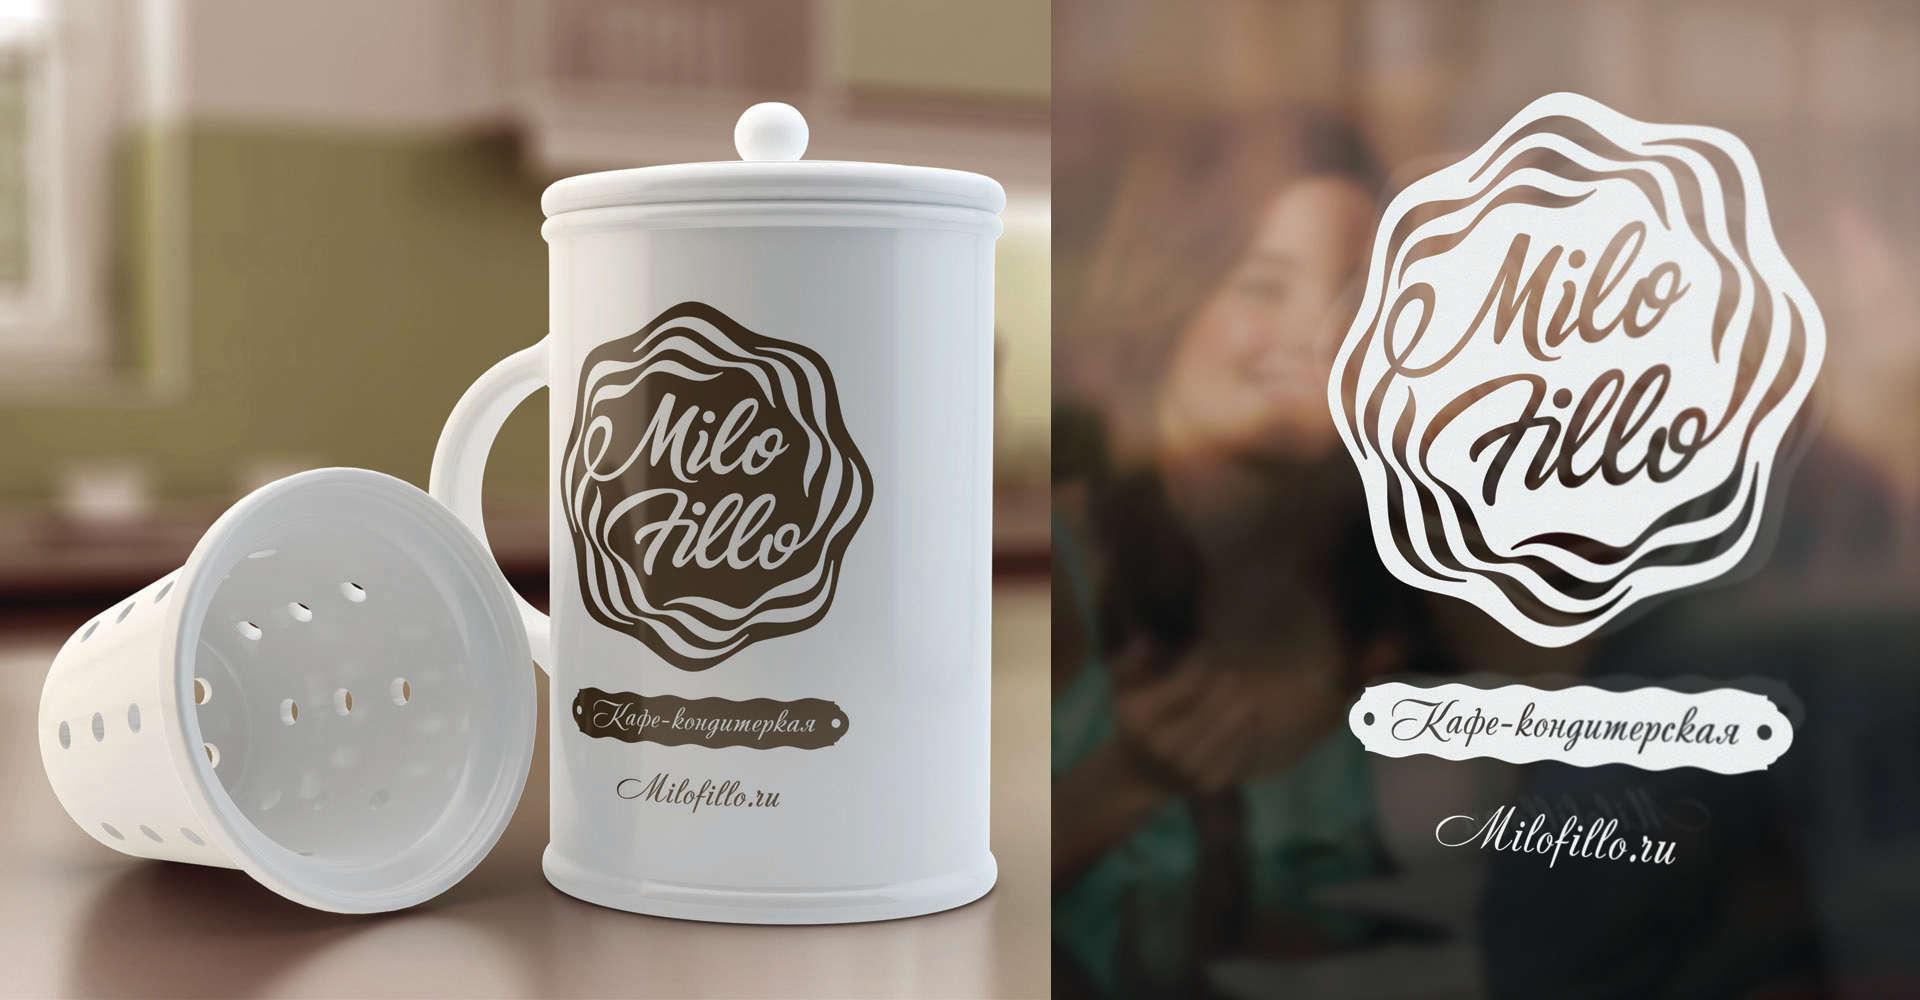 Разработка логотипа кафе, Cafe logo